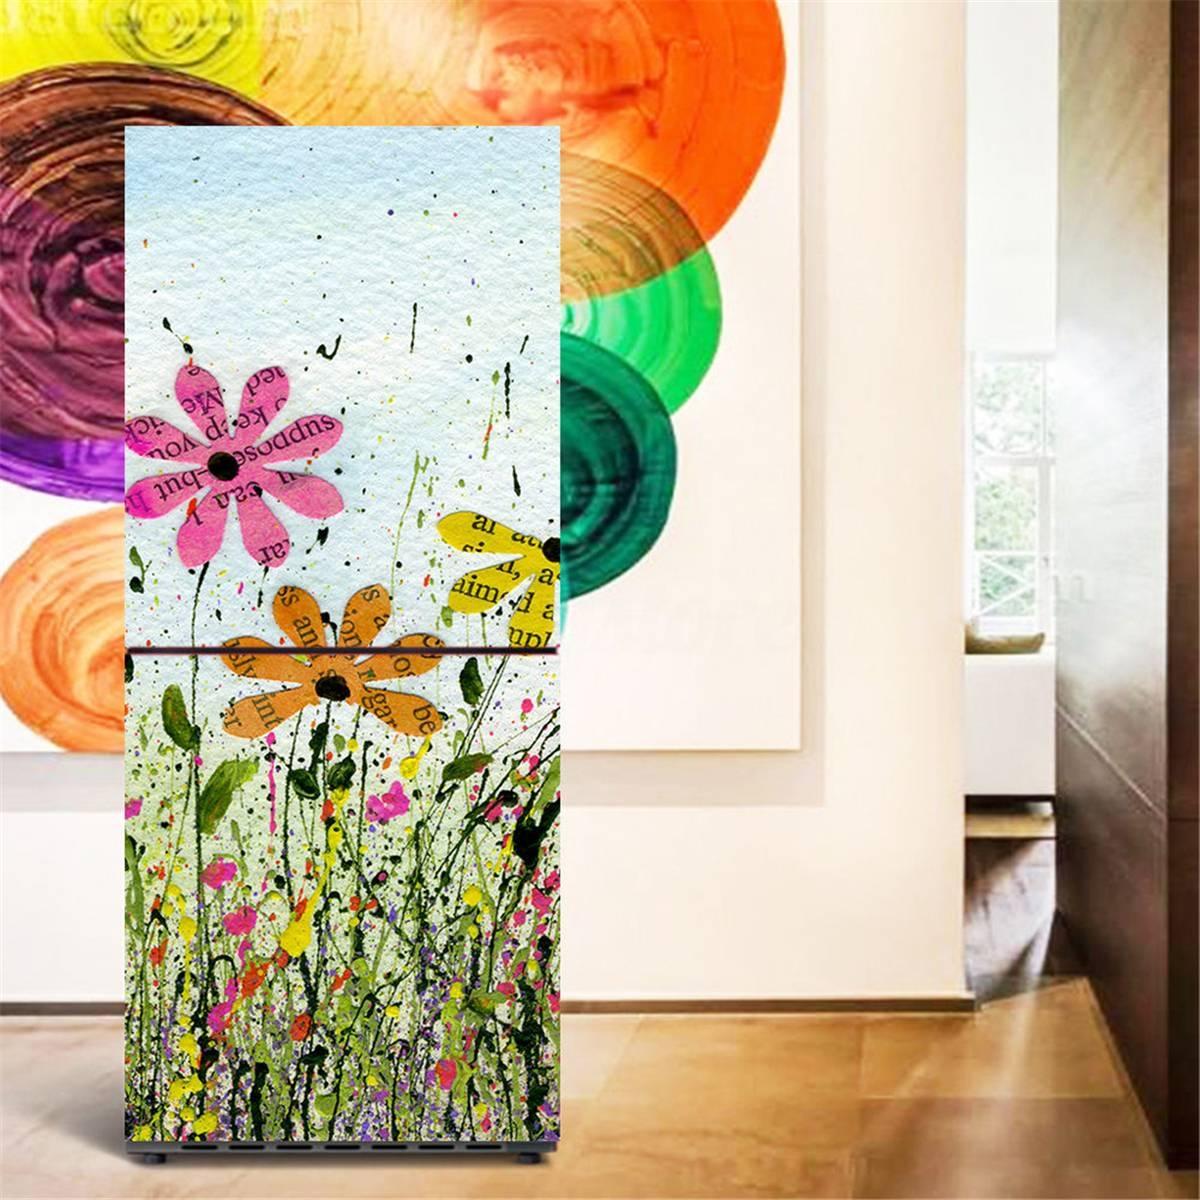 3D Wall Art Sticker Vinyl Decal Self Adhesive Door Fridge Wrap Inside Best And Newest Vinyl 3D Wall Art (Gallery 9 of 20)